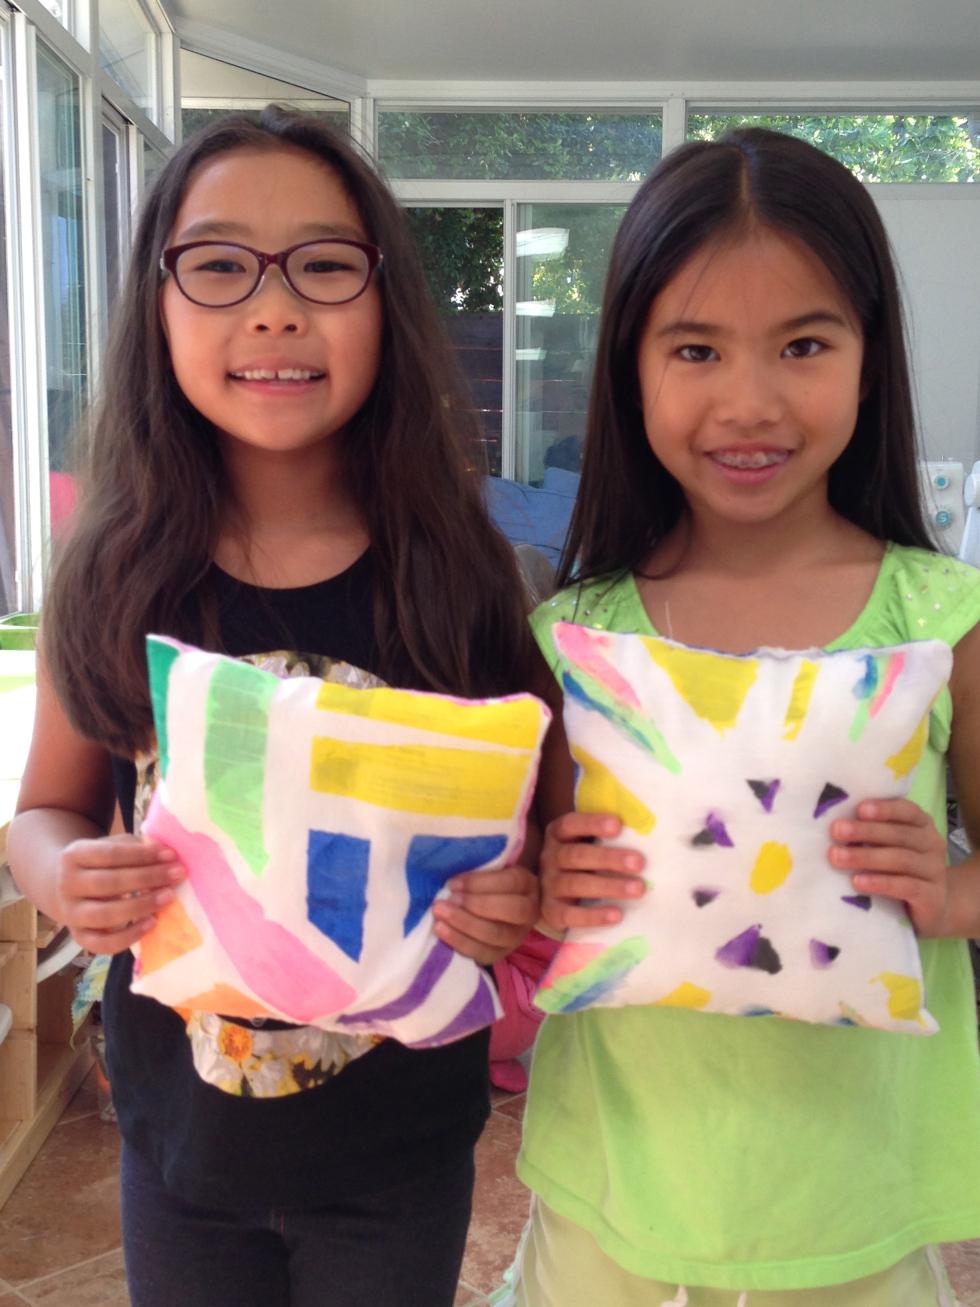 2nd and 3rd grader pillows.